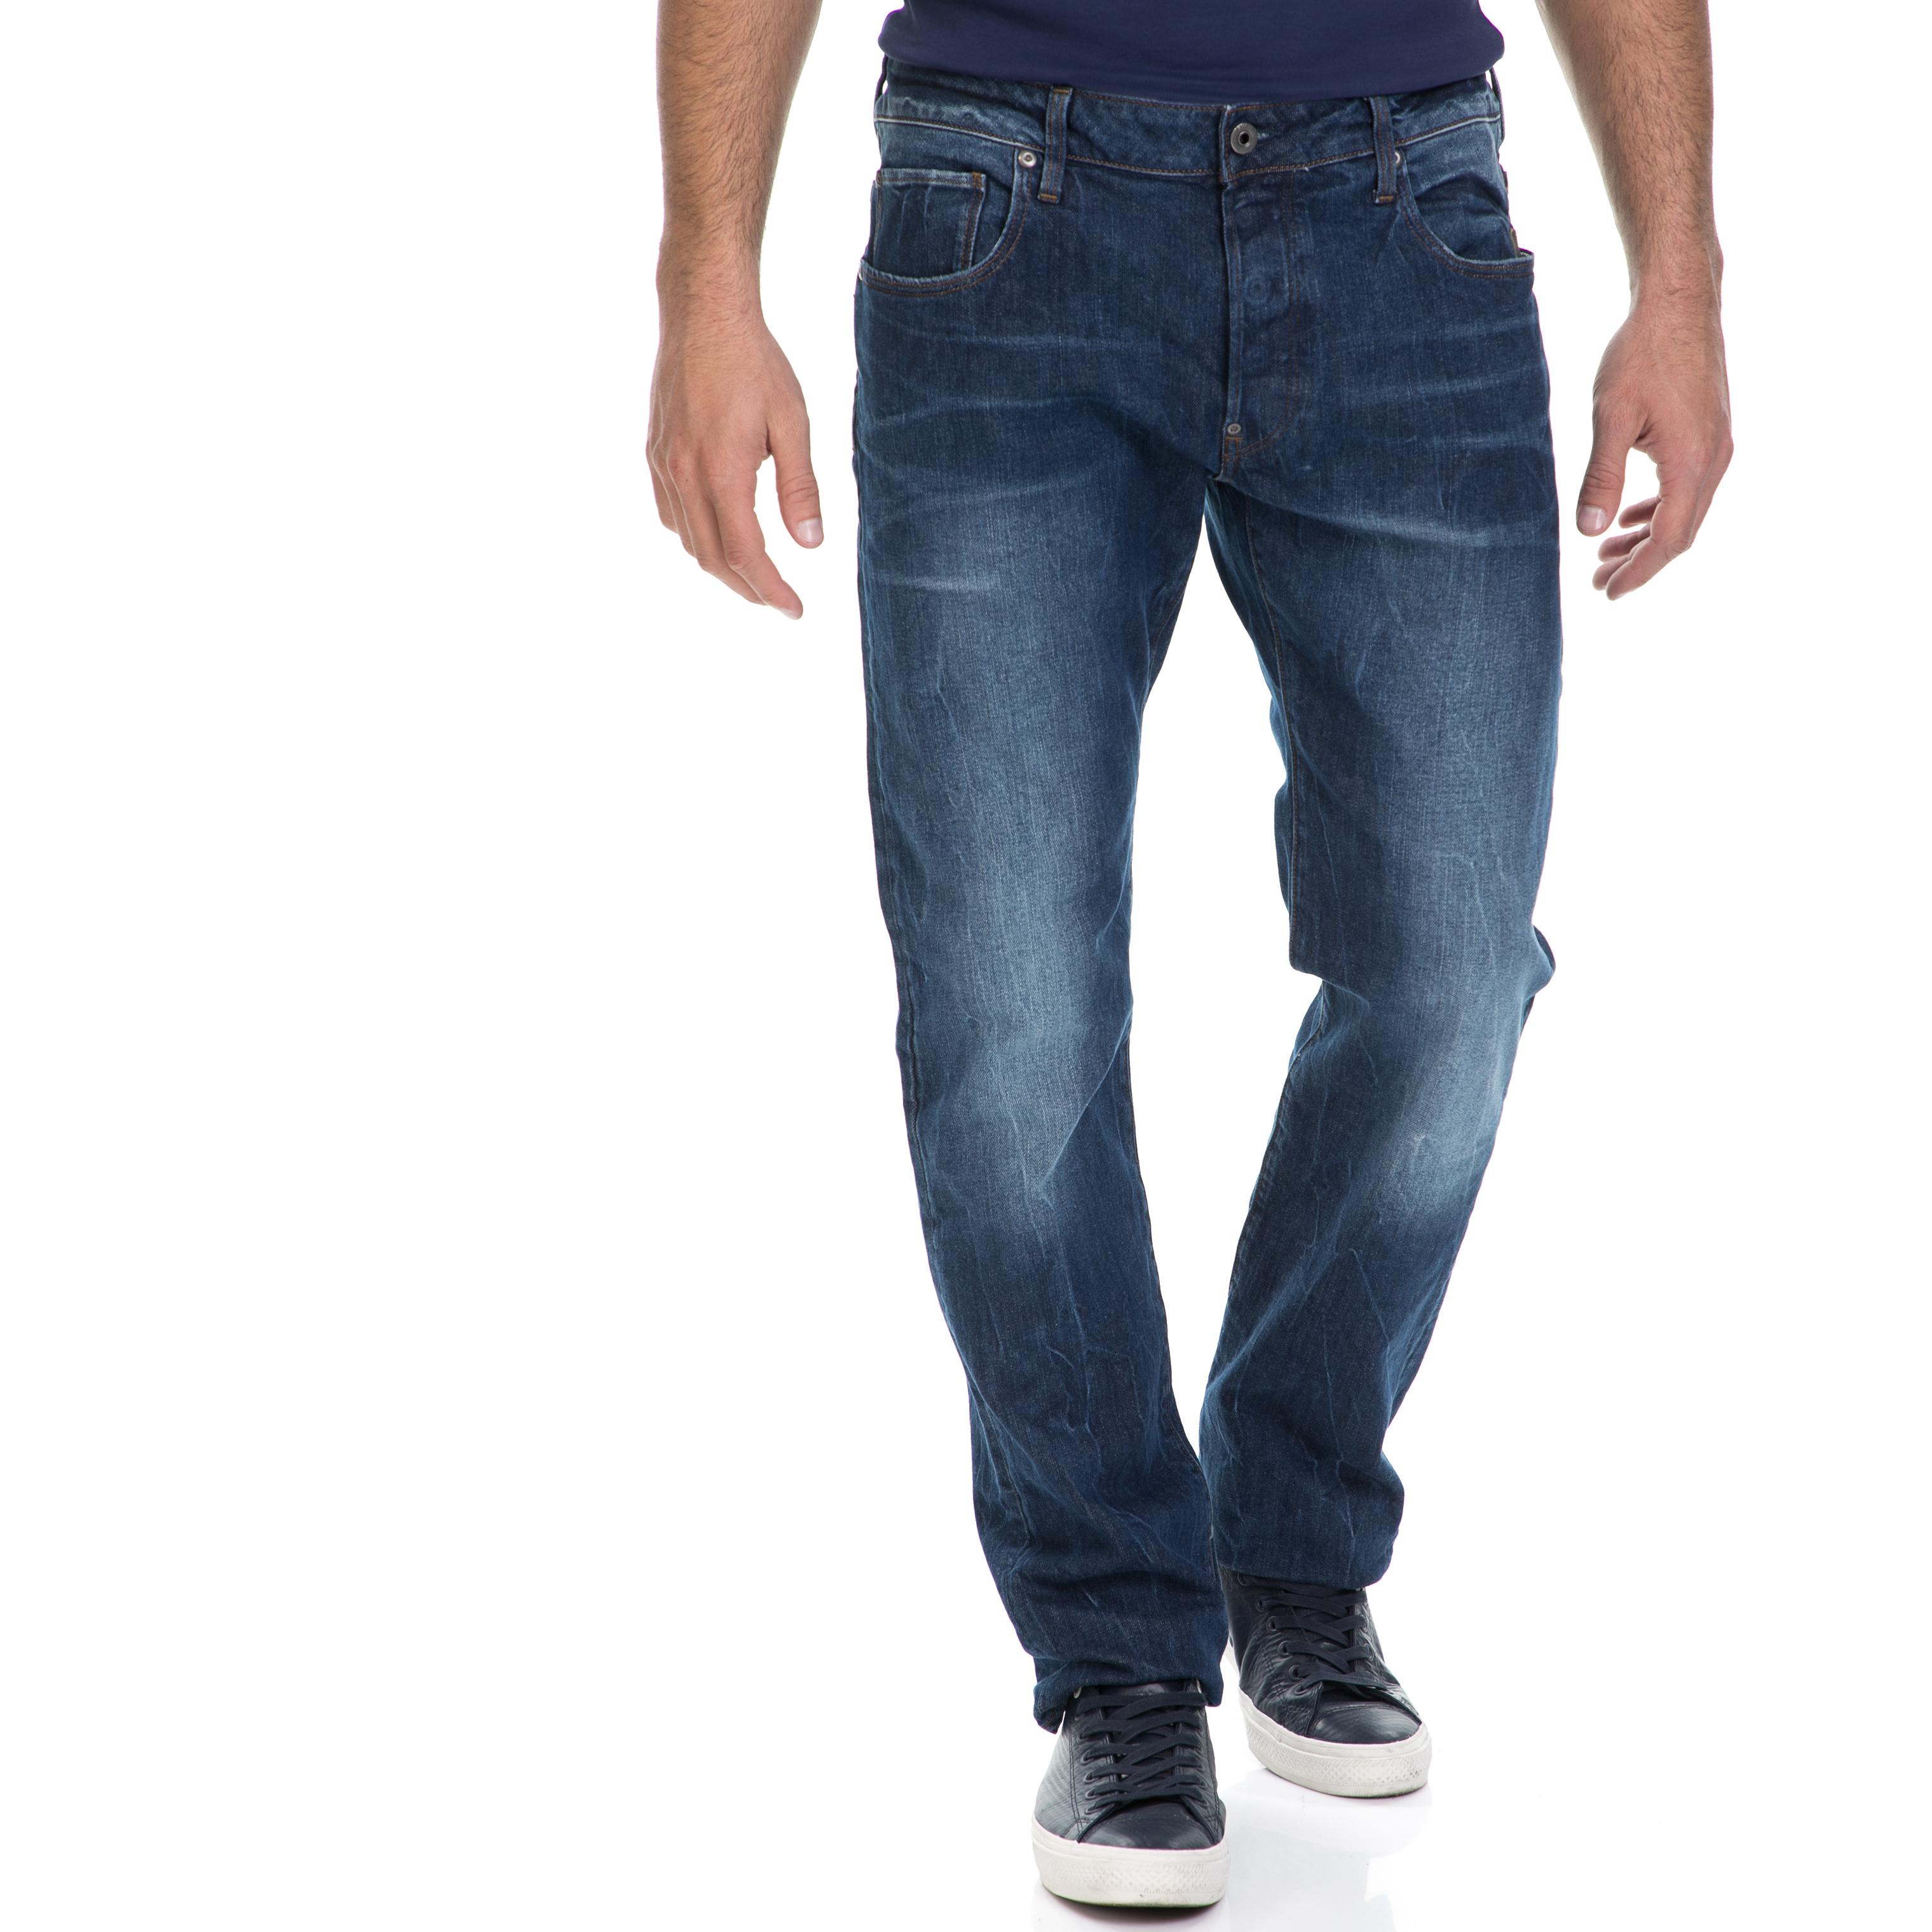 G-STAR - Ανδρικό τζιν παντελόνι defend G-STAR μπλε ανδρικά ρούχα παντελόνια jean